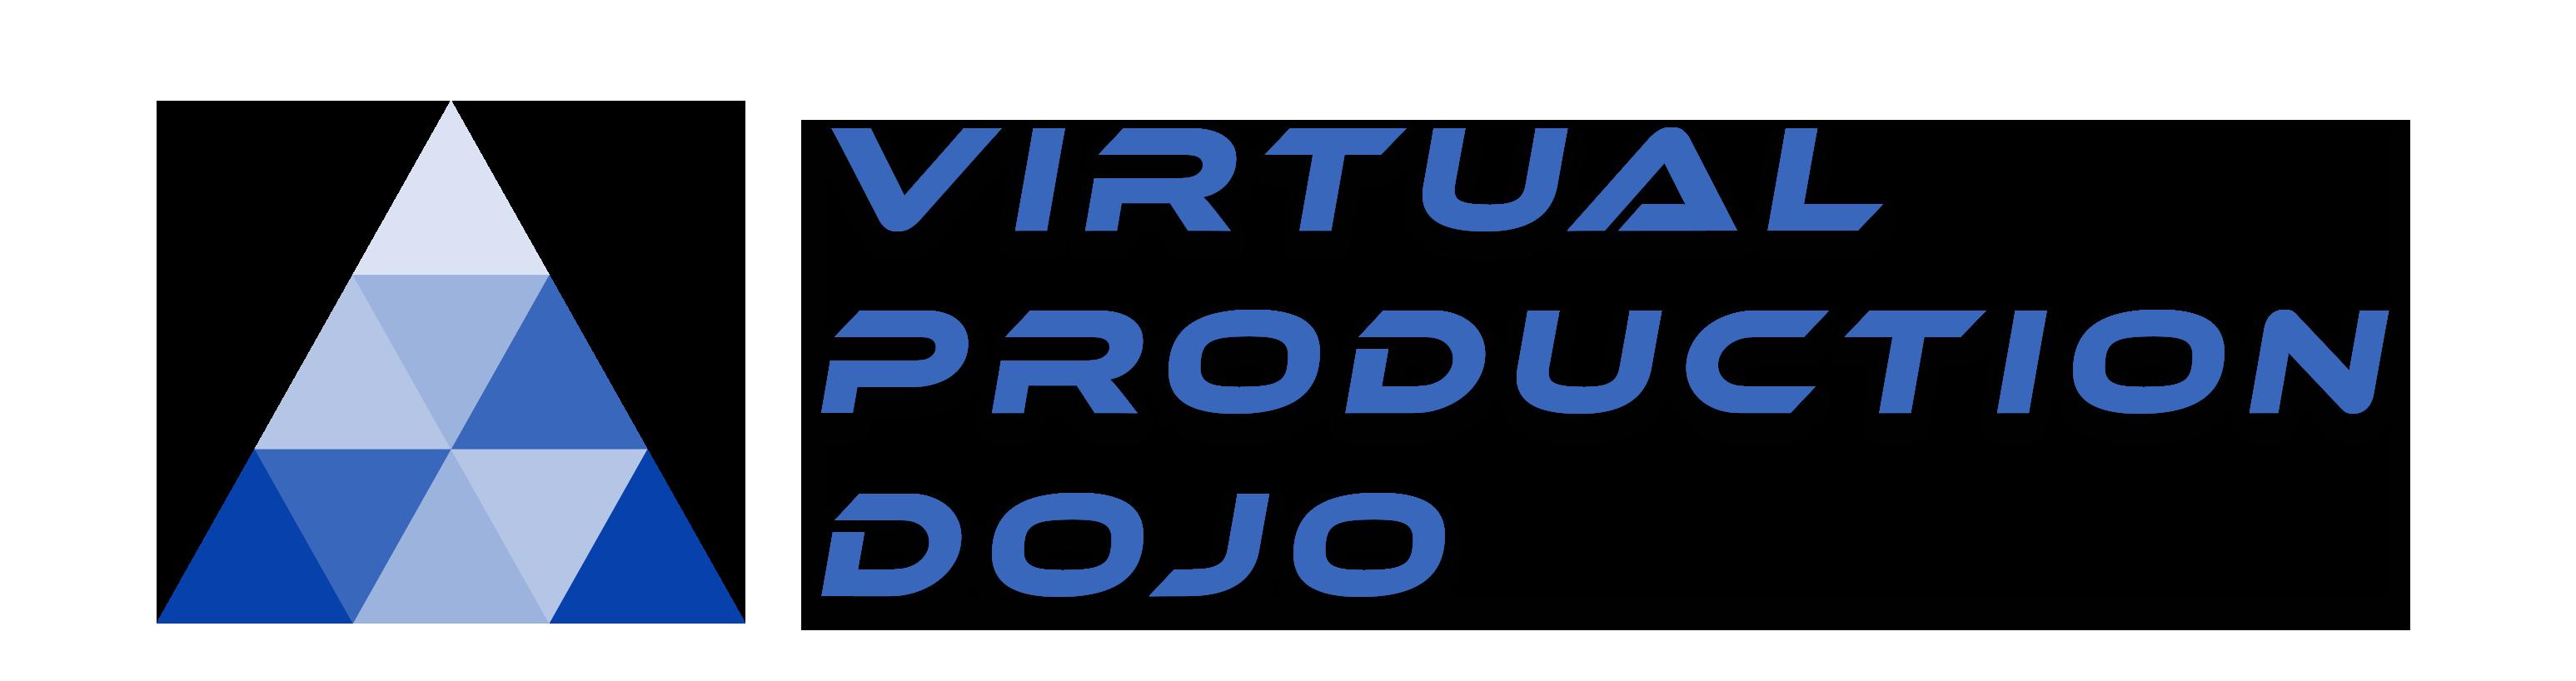 Virtual Production Dojo